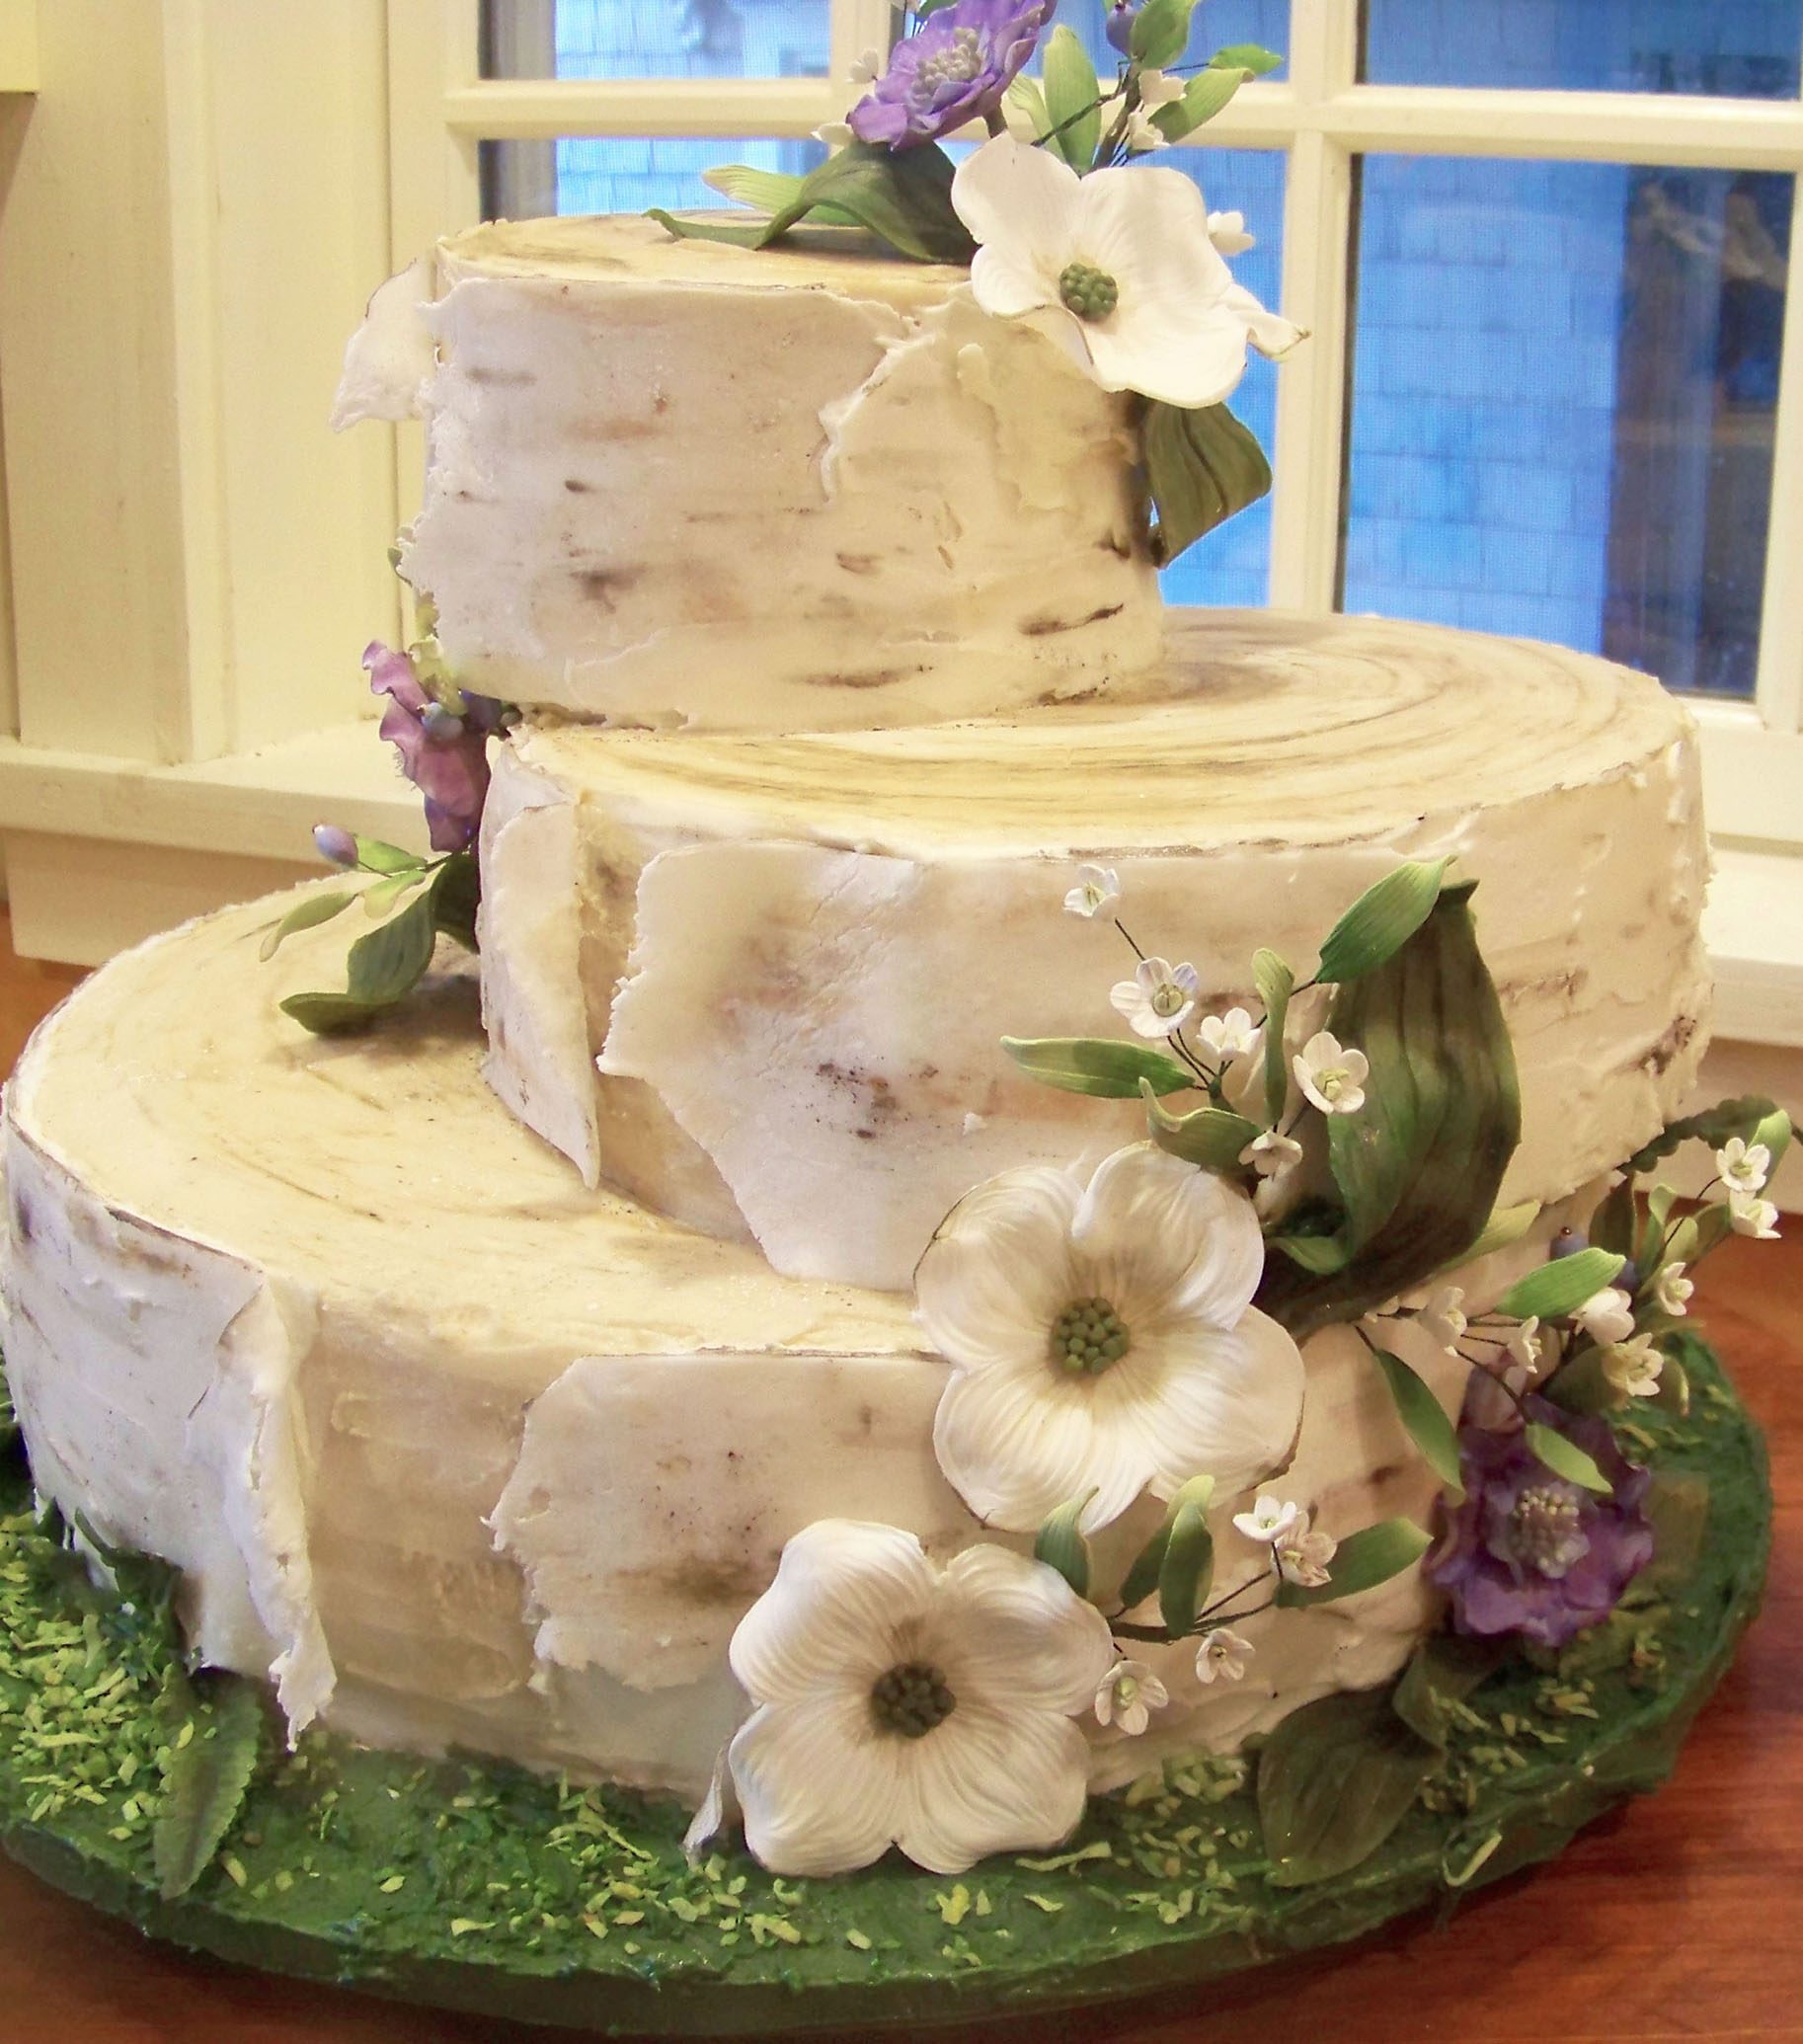 Vermont Wedding Cakes | VERMONT WEDDING PARLOR